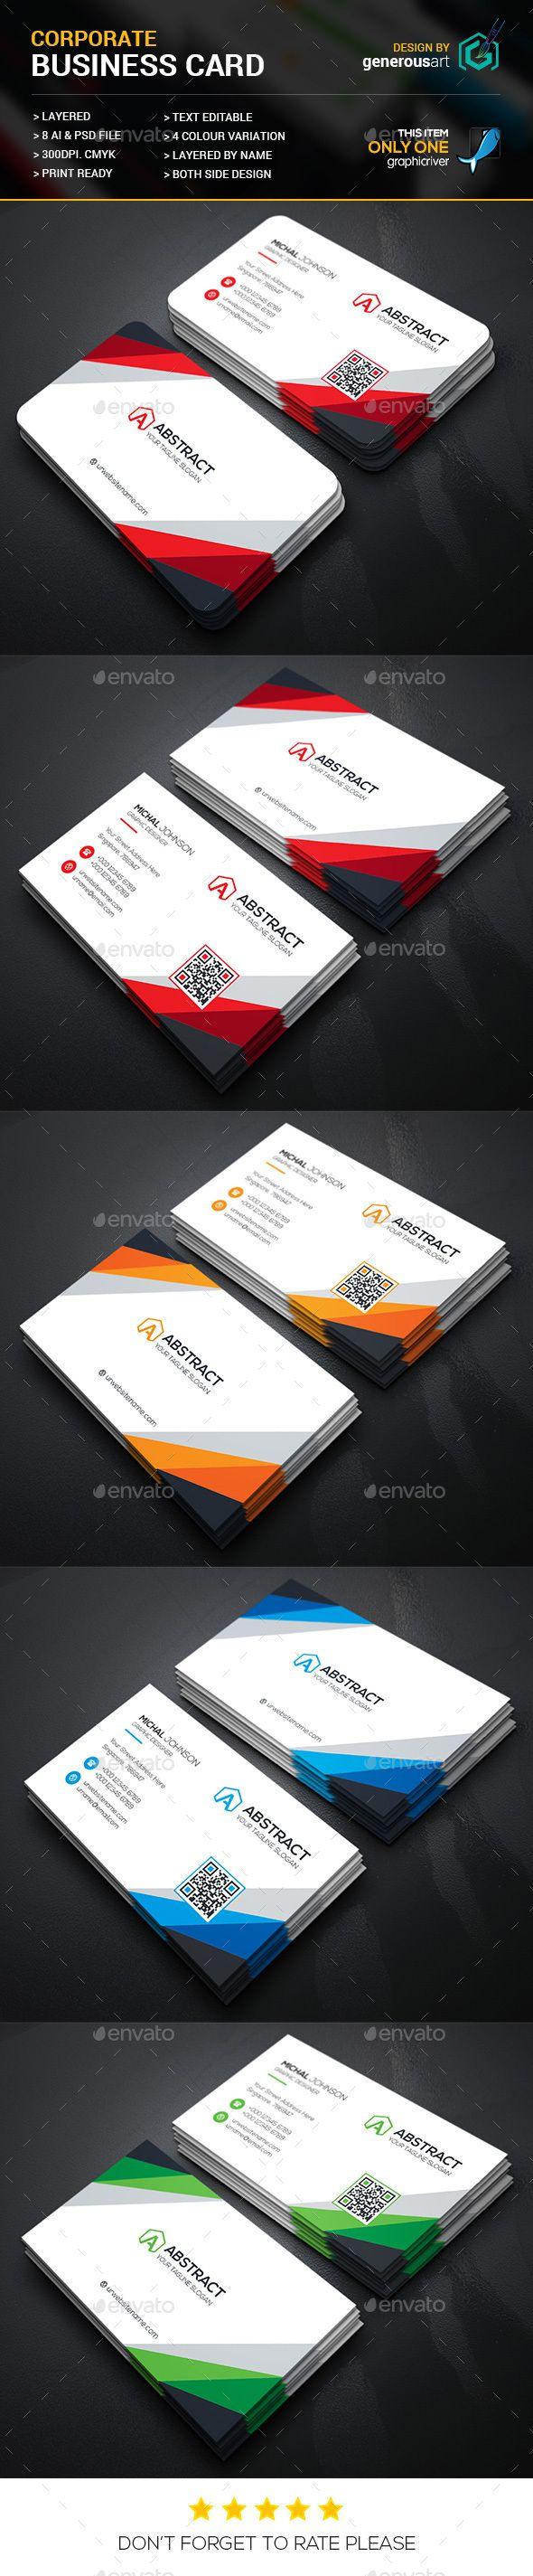 24 best Business Cards images on Pinterest | Business card design ...